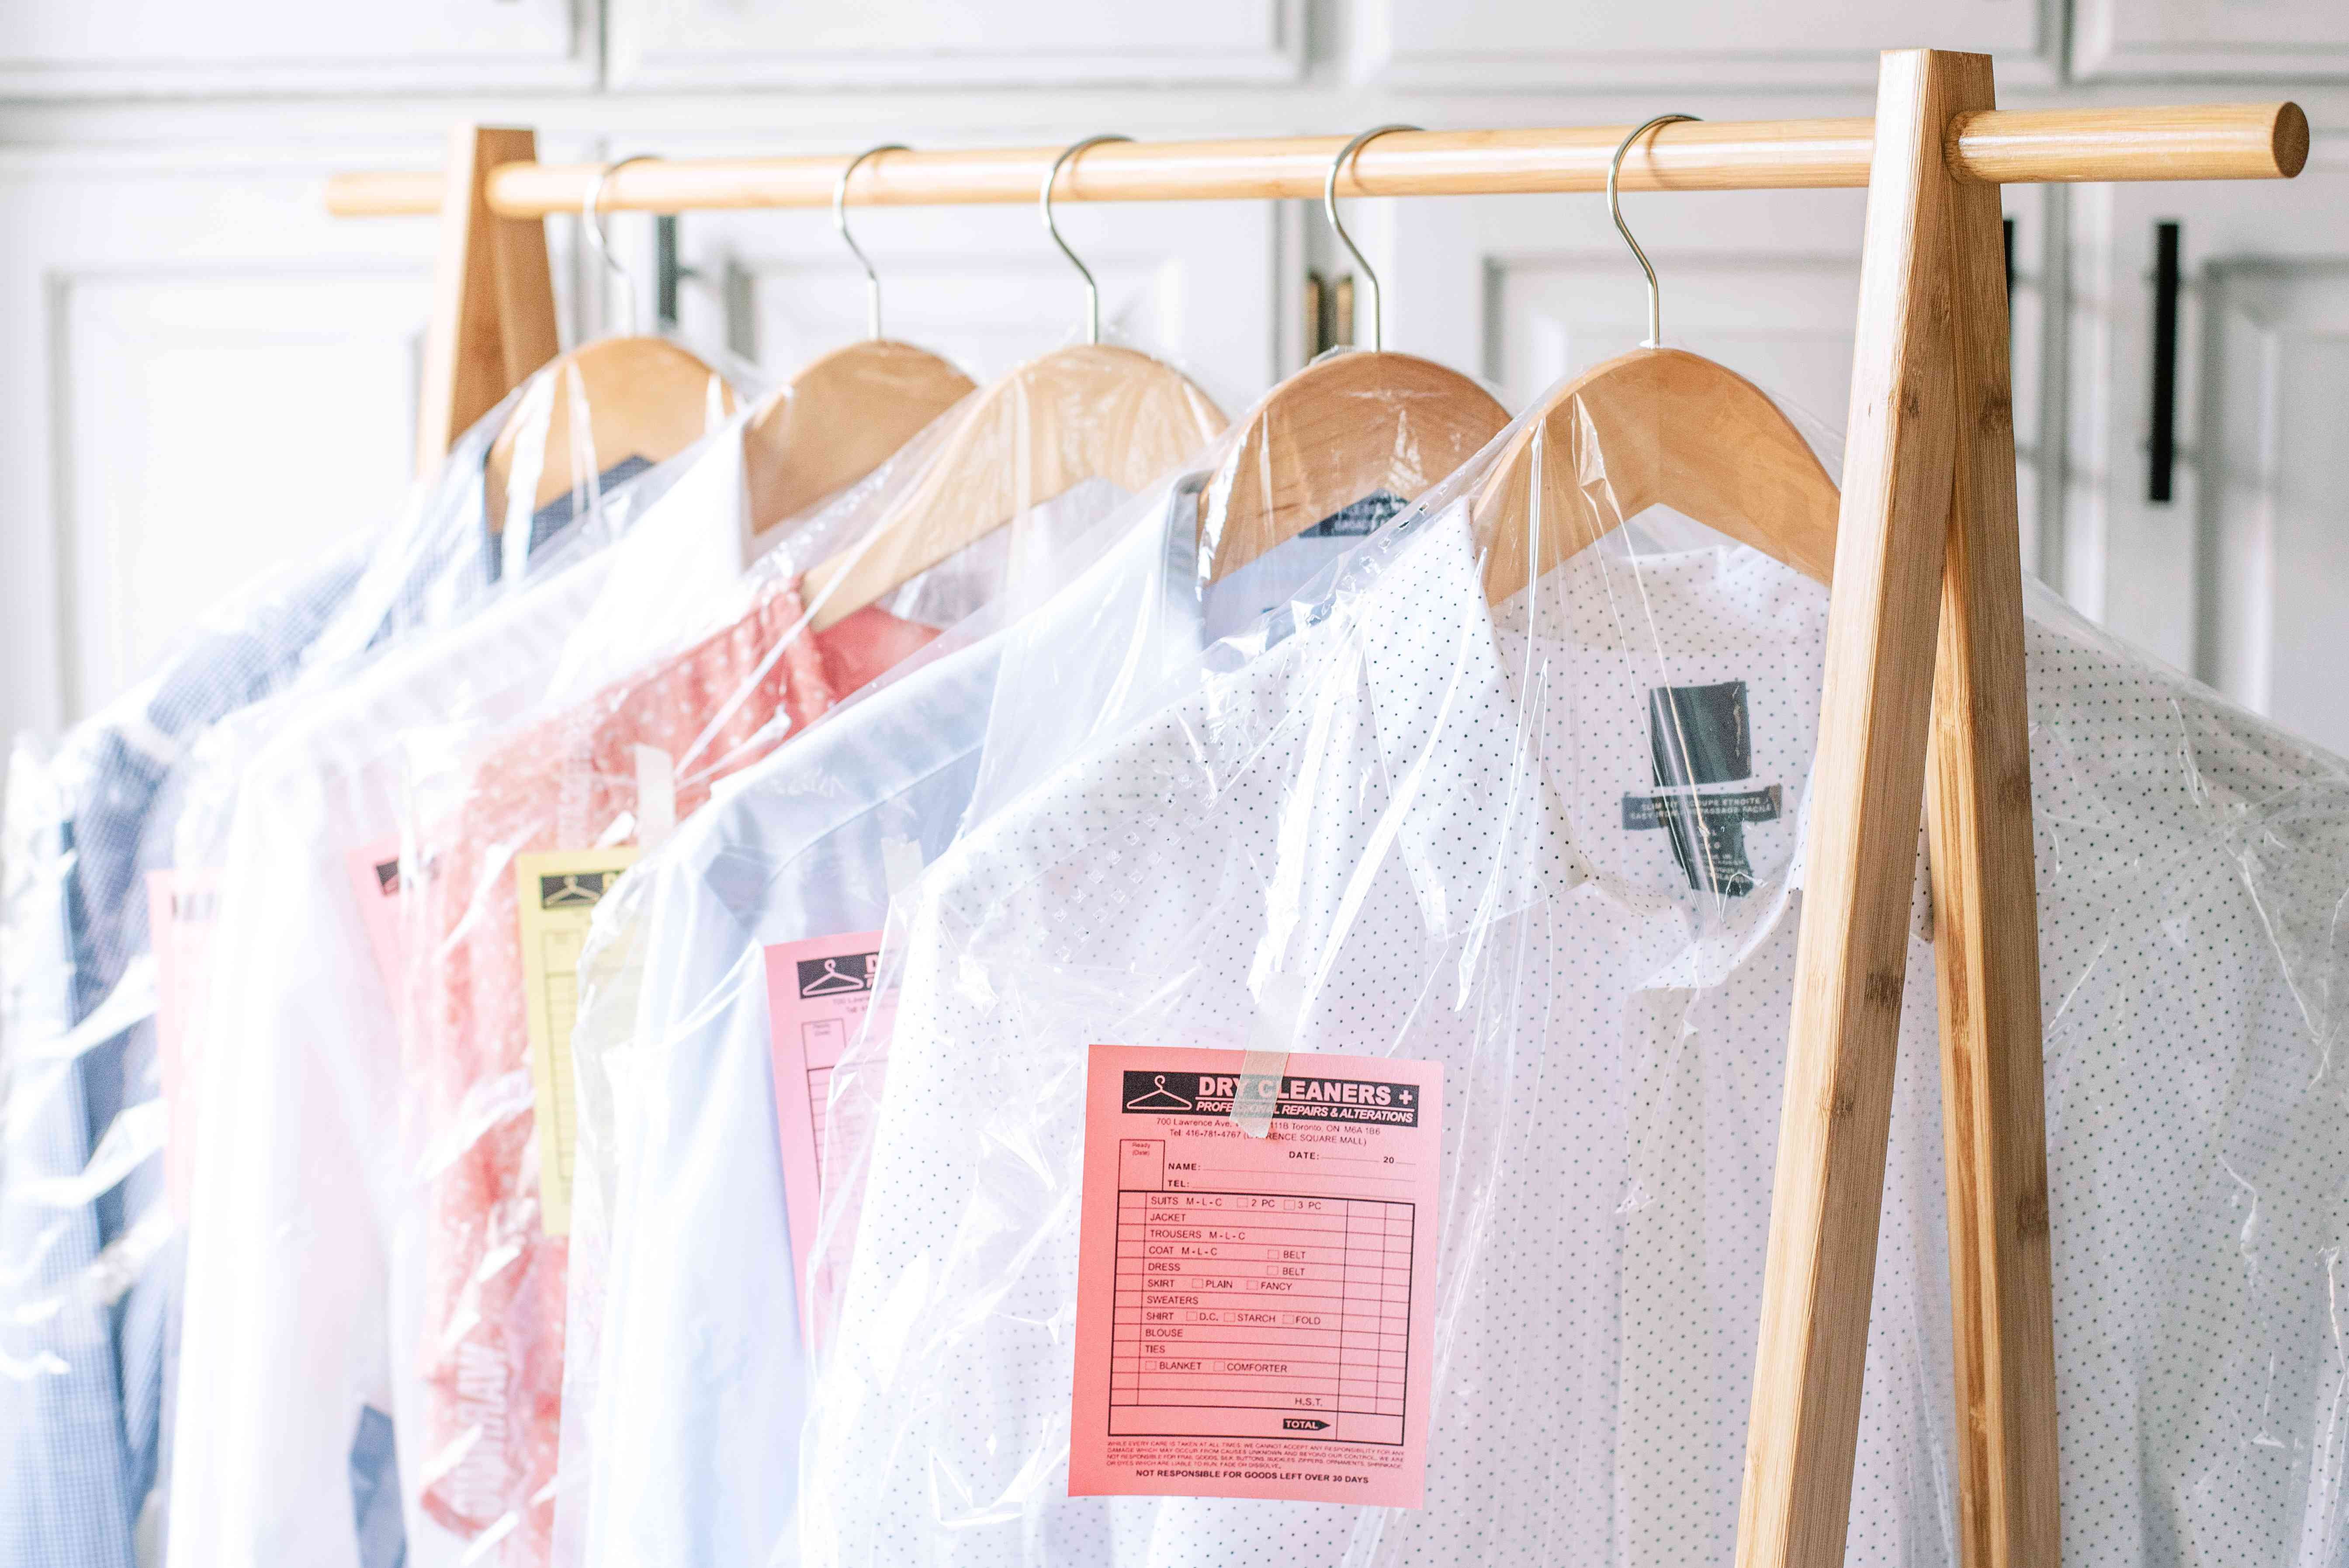 garment tags